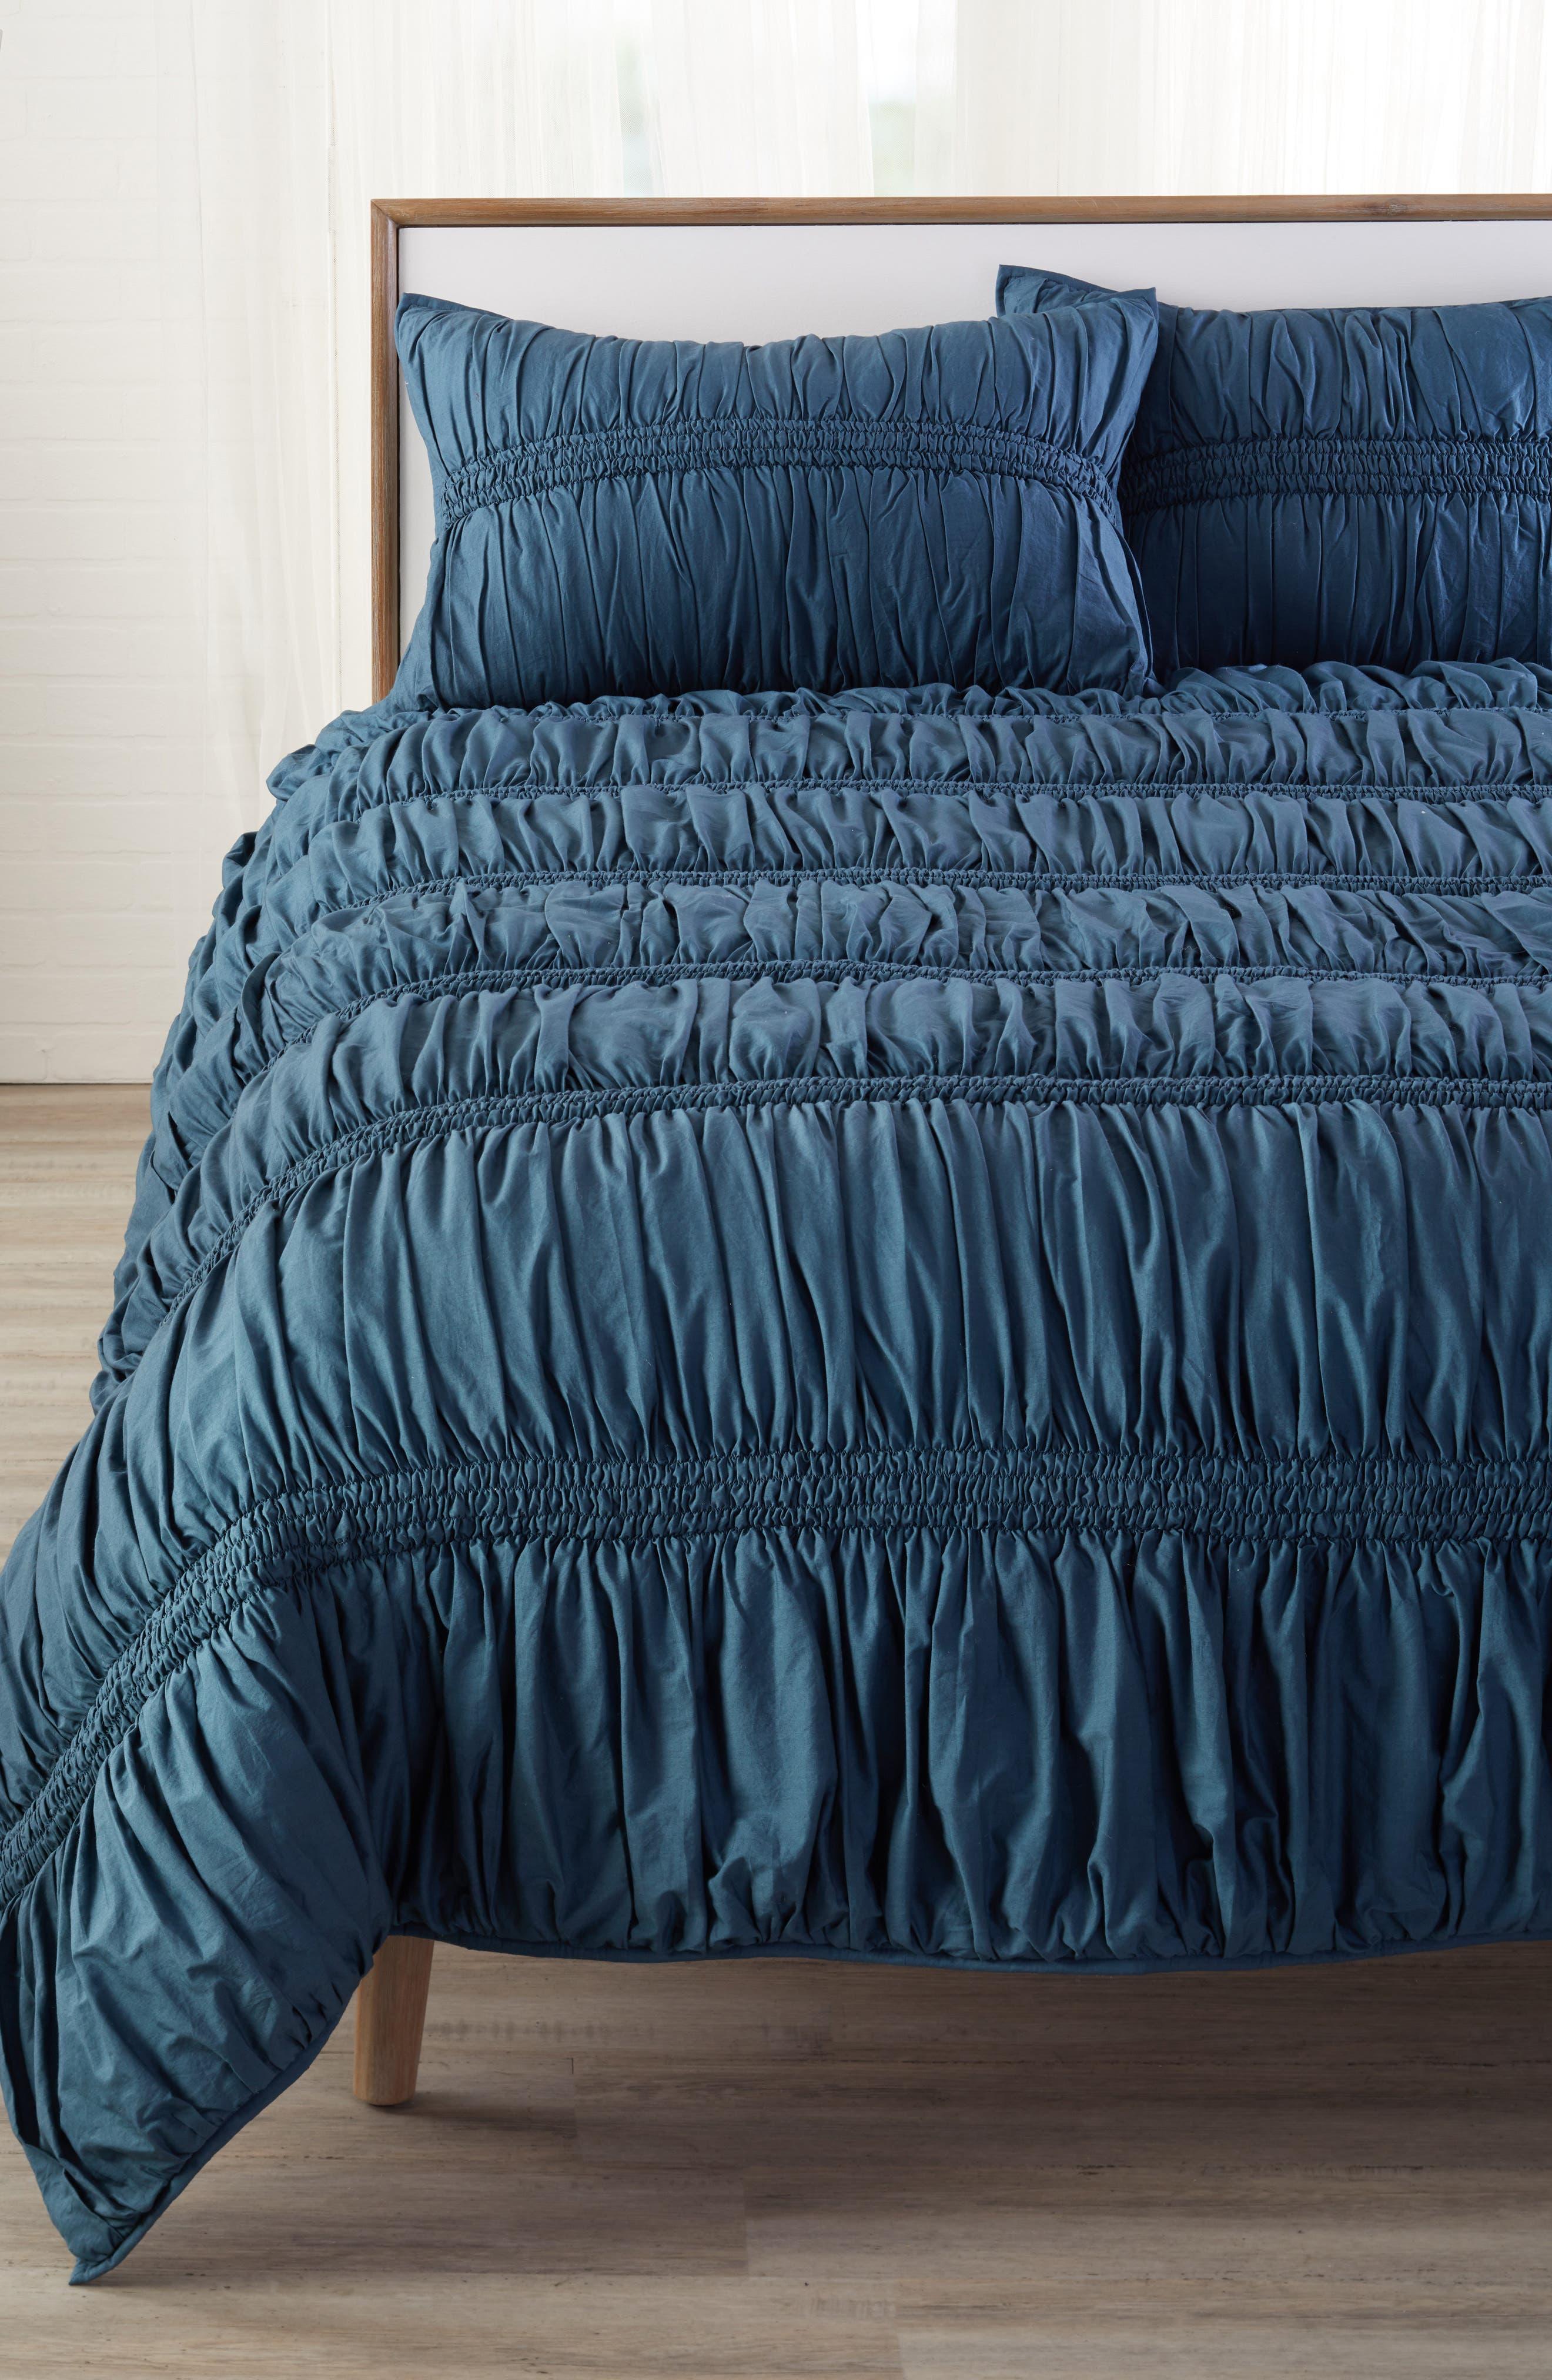 Solid Ruched Comforter,                         Main,                         color, TEAL GAZER